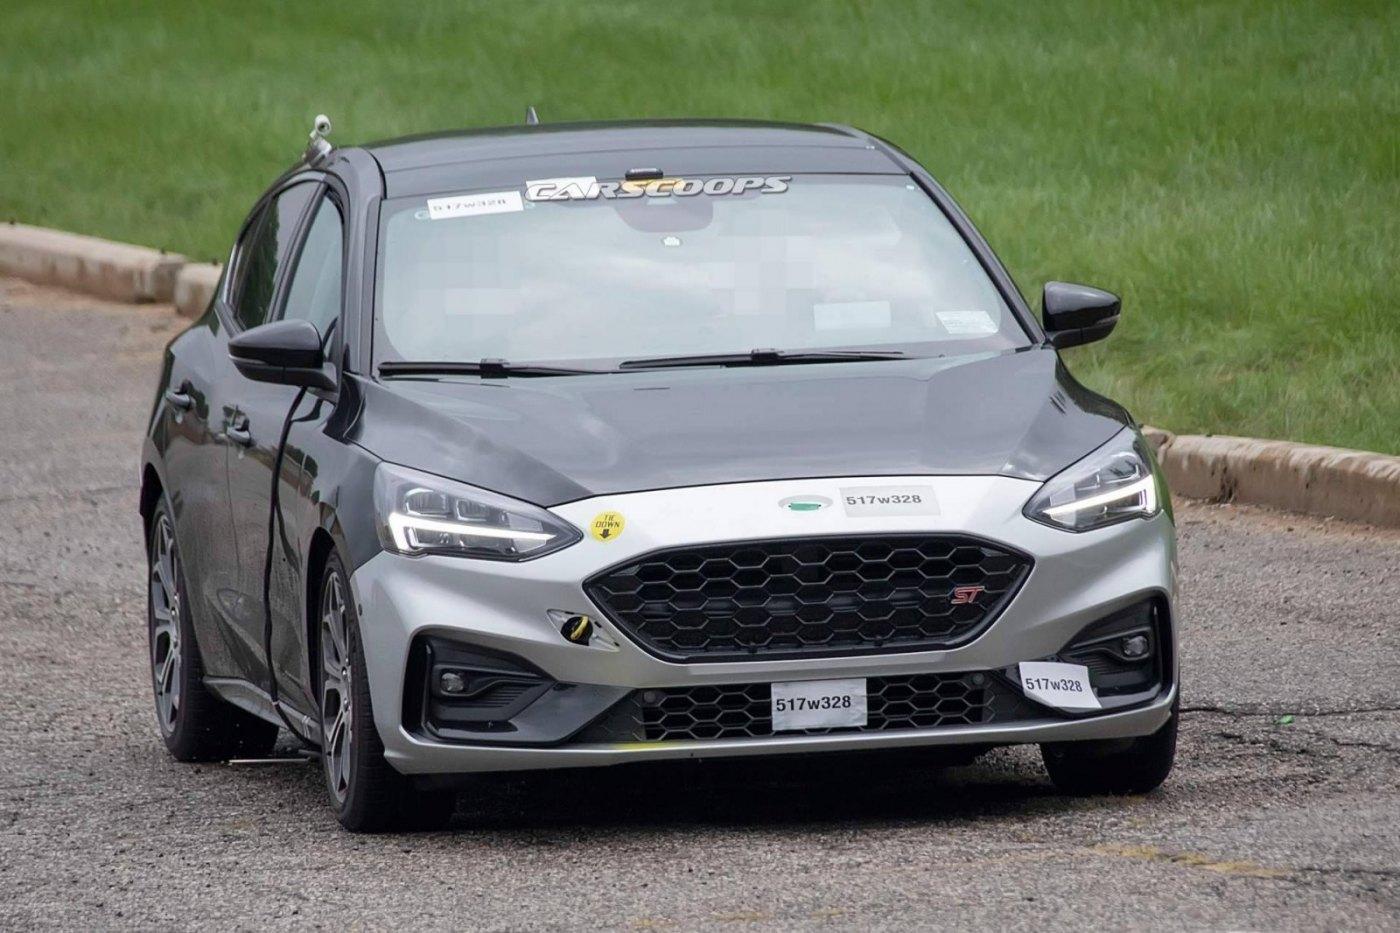 59233a50-2019-ford-focus-st-spy-shots-2.jpg